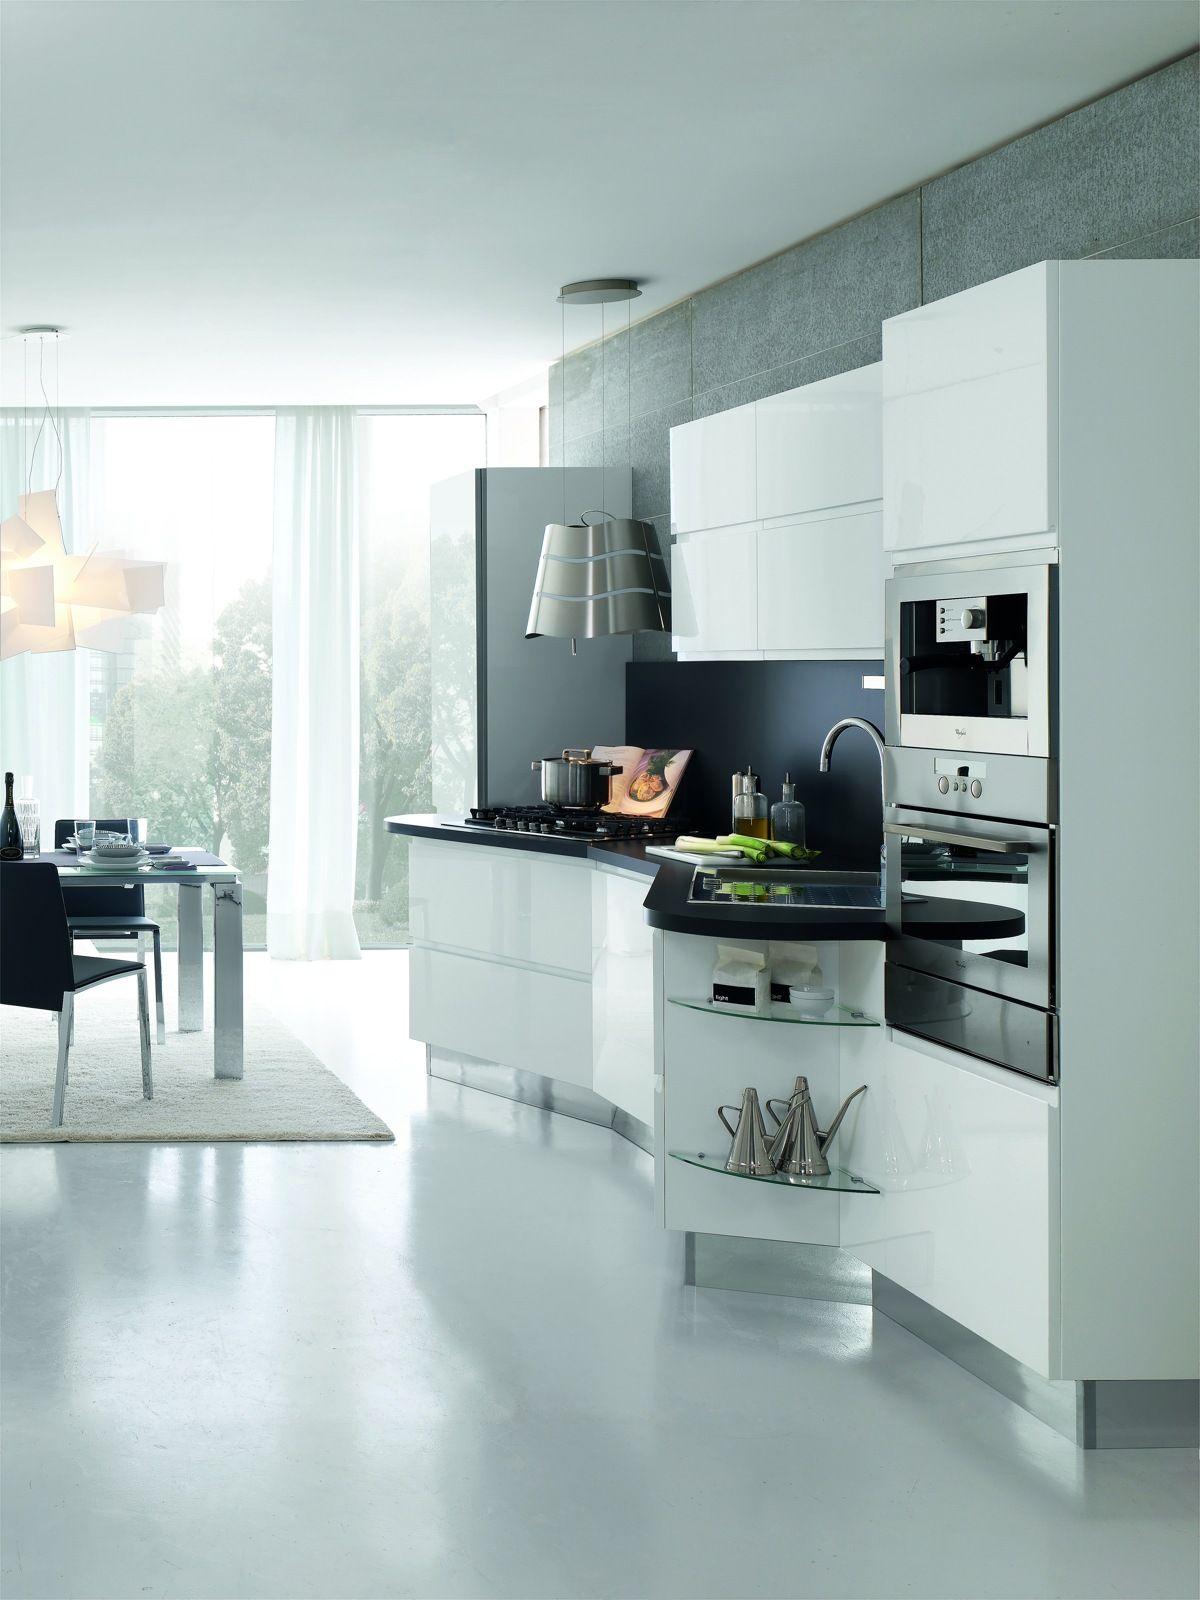 Cucina Stosa Bring | Stosa Point Roma | Cucine, Arredamento ...